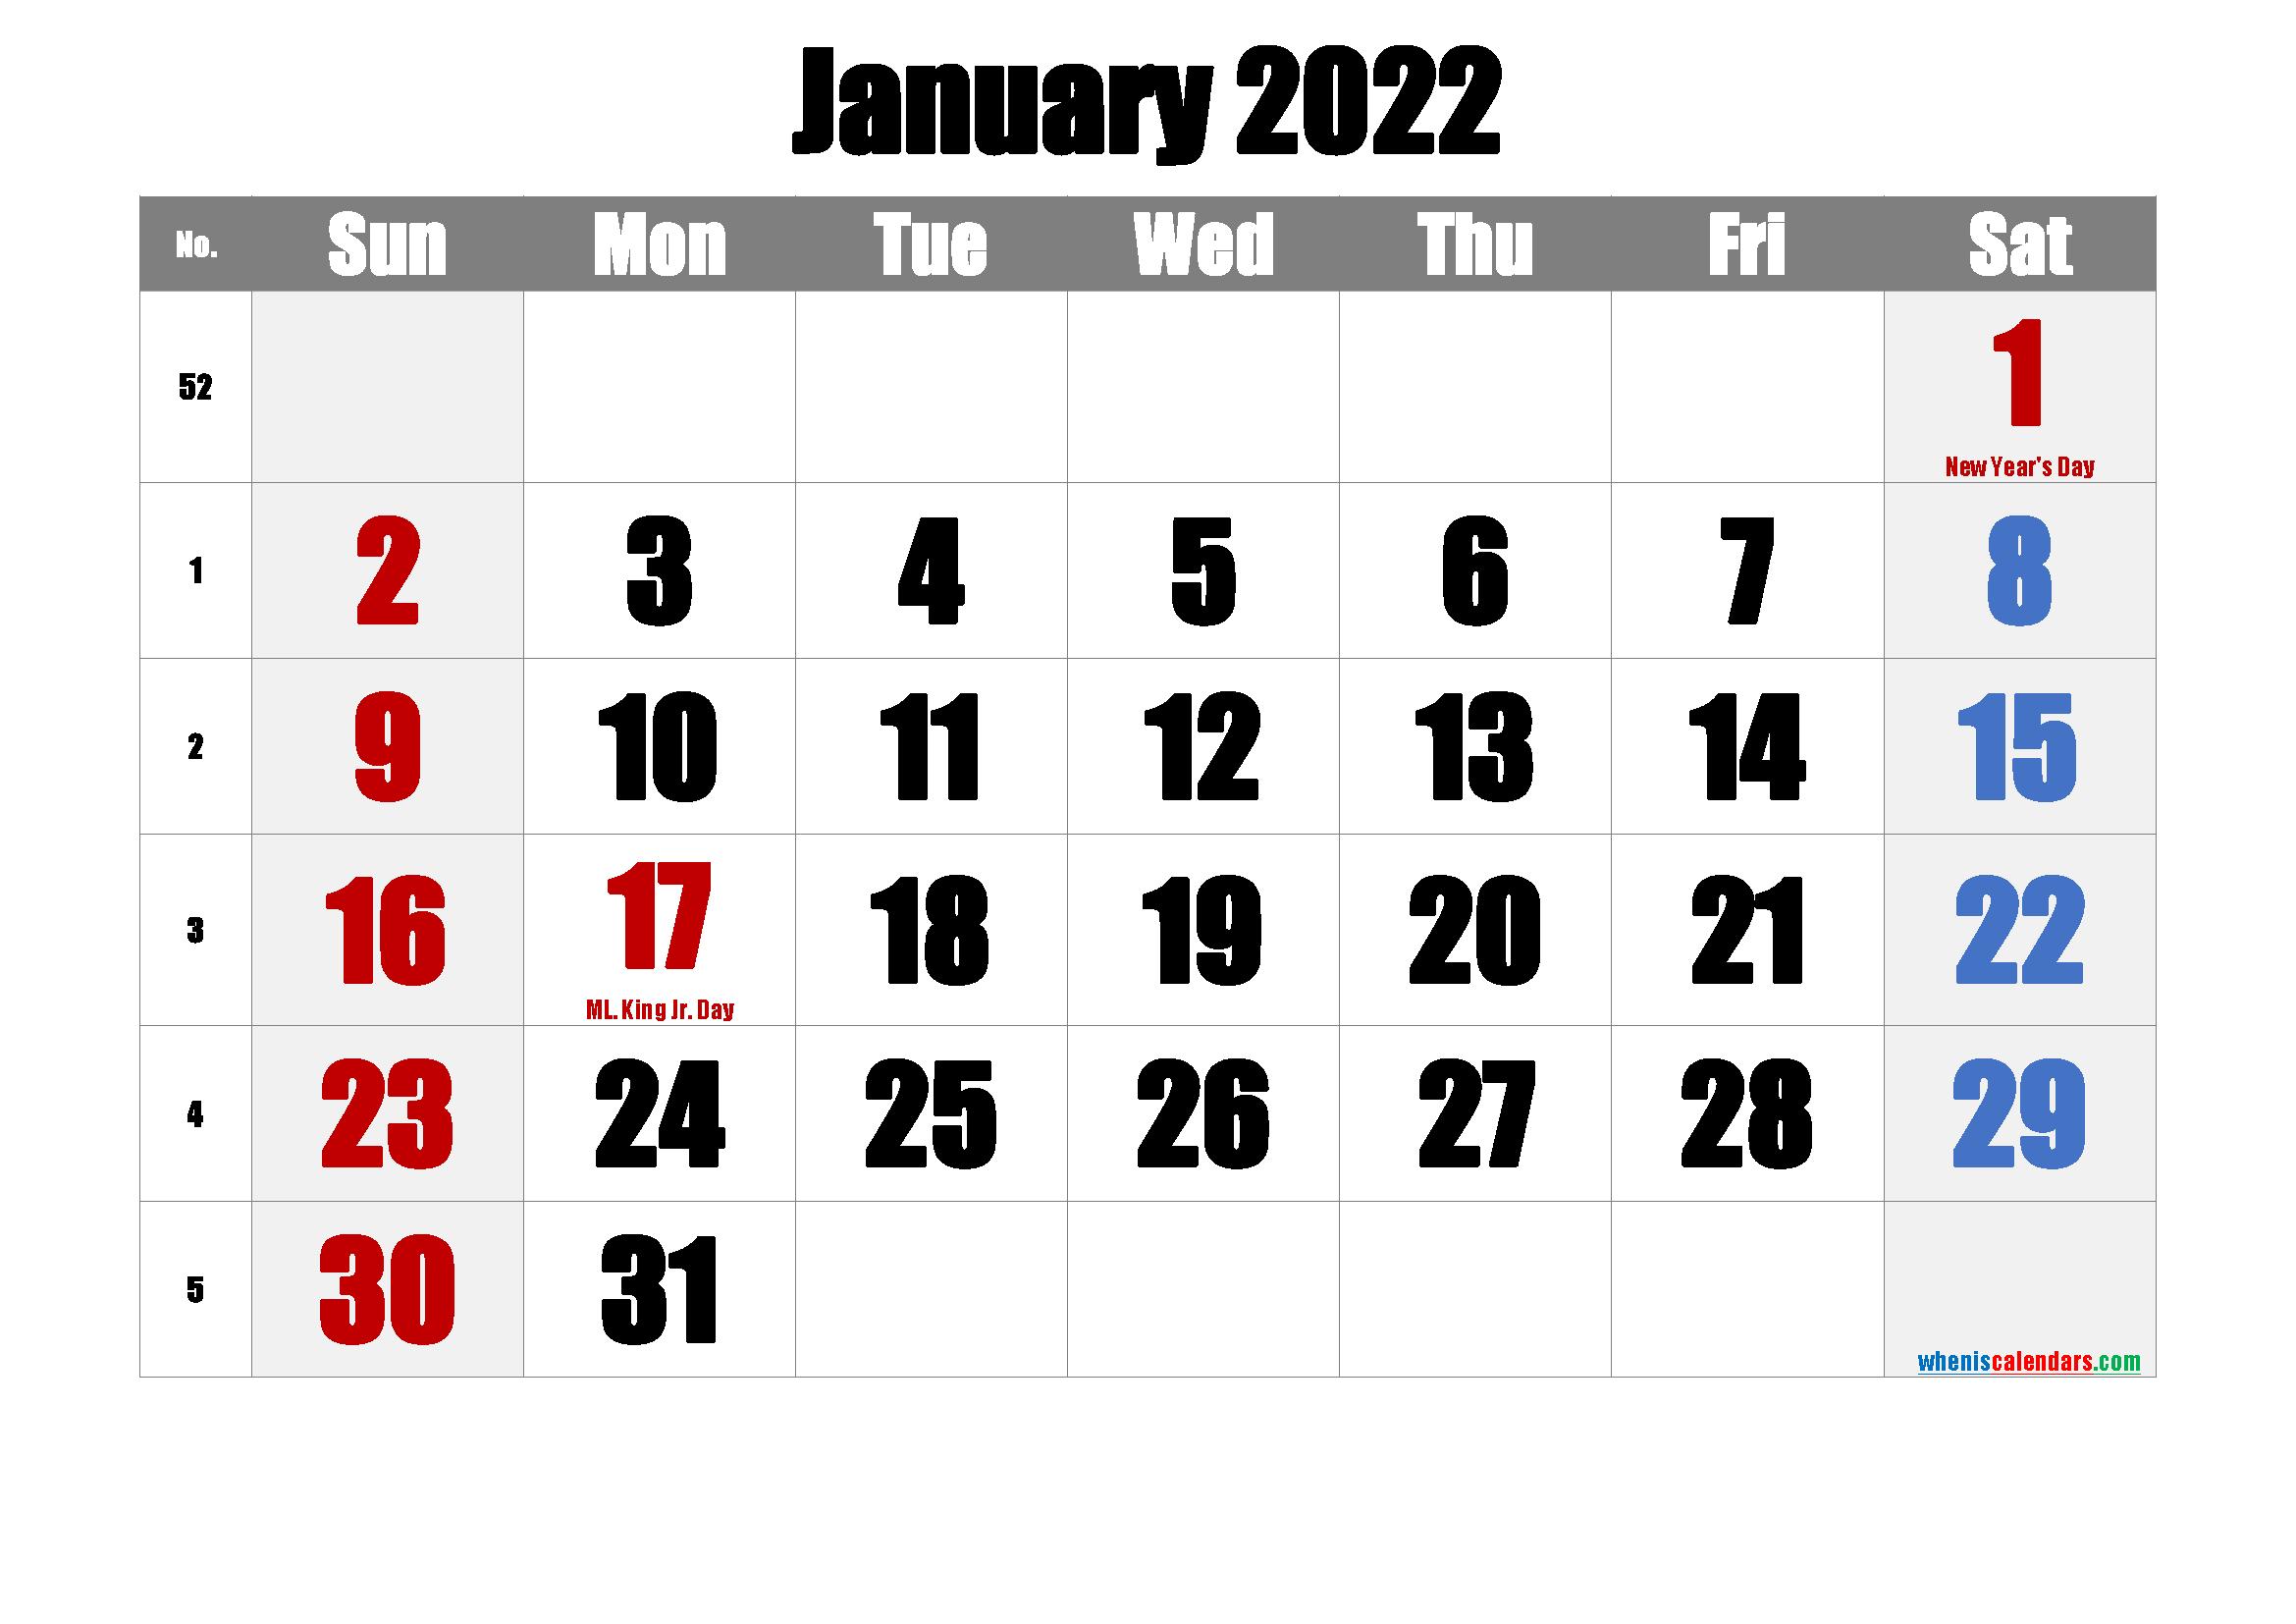 January 2022 Printable Calendar With Holidays – Free Pertaining To Free Printable Calendar January 2022 With Holidays